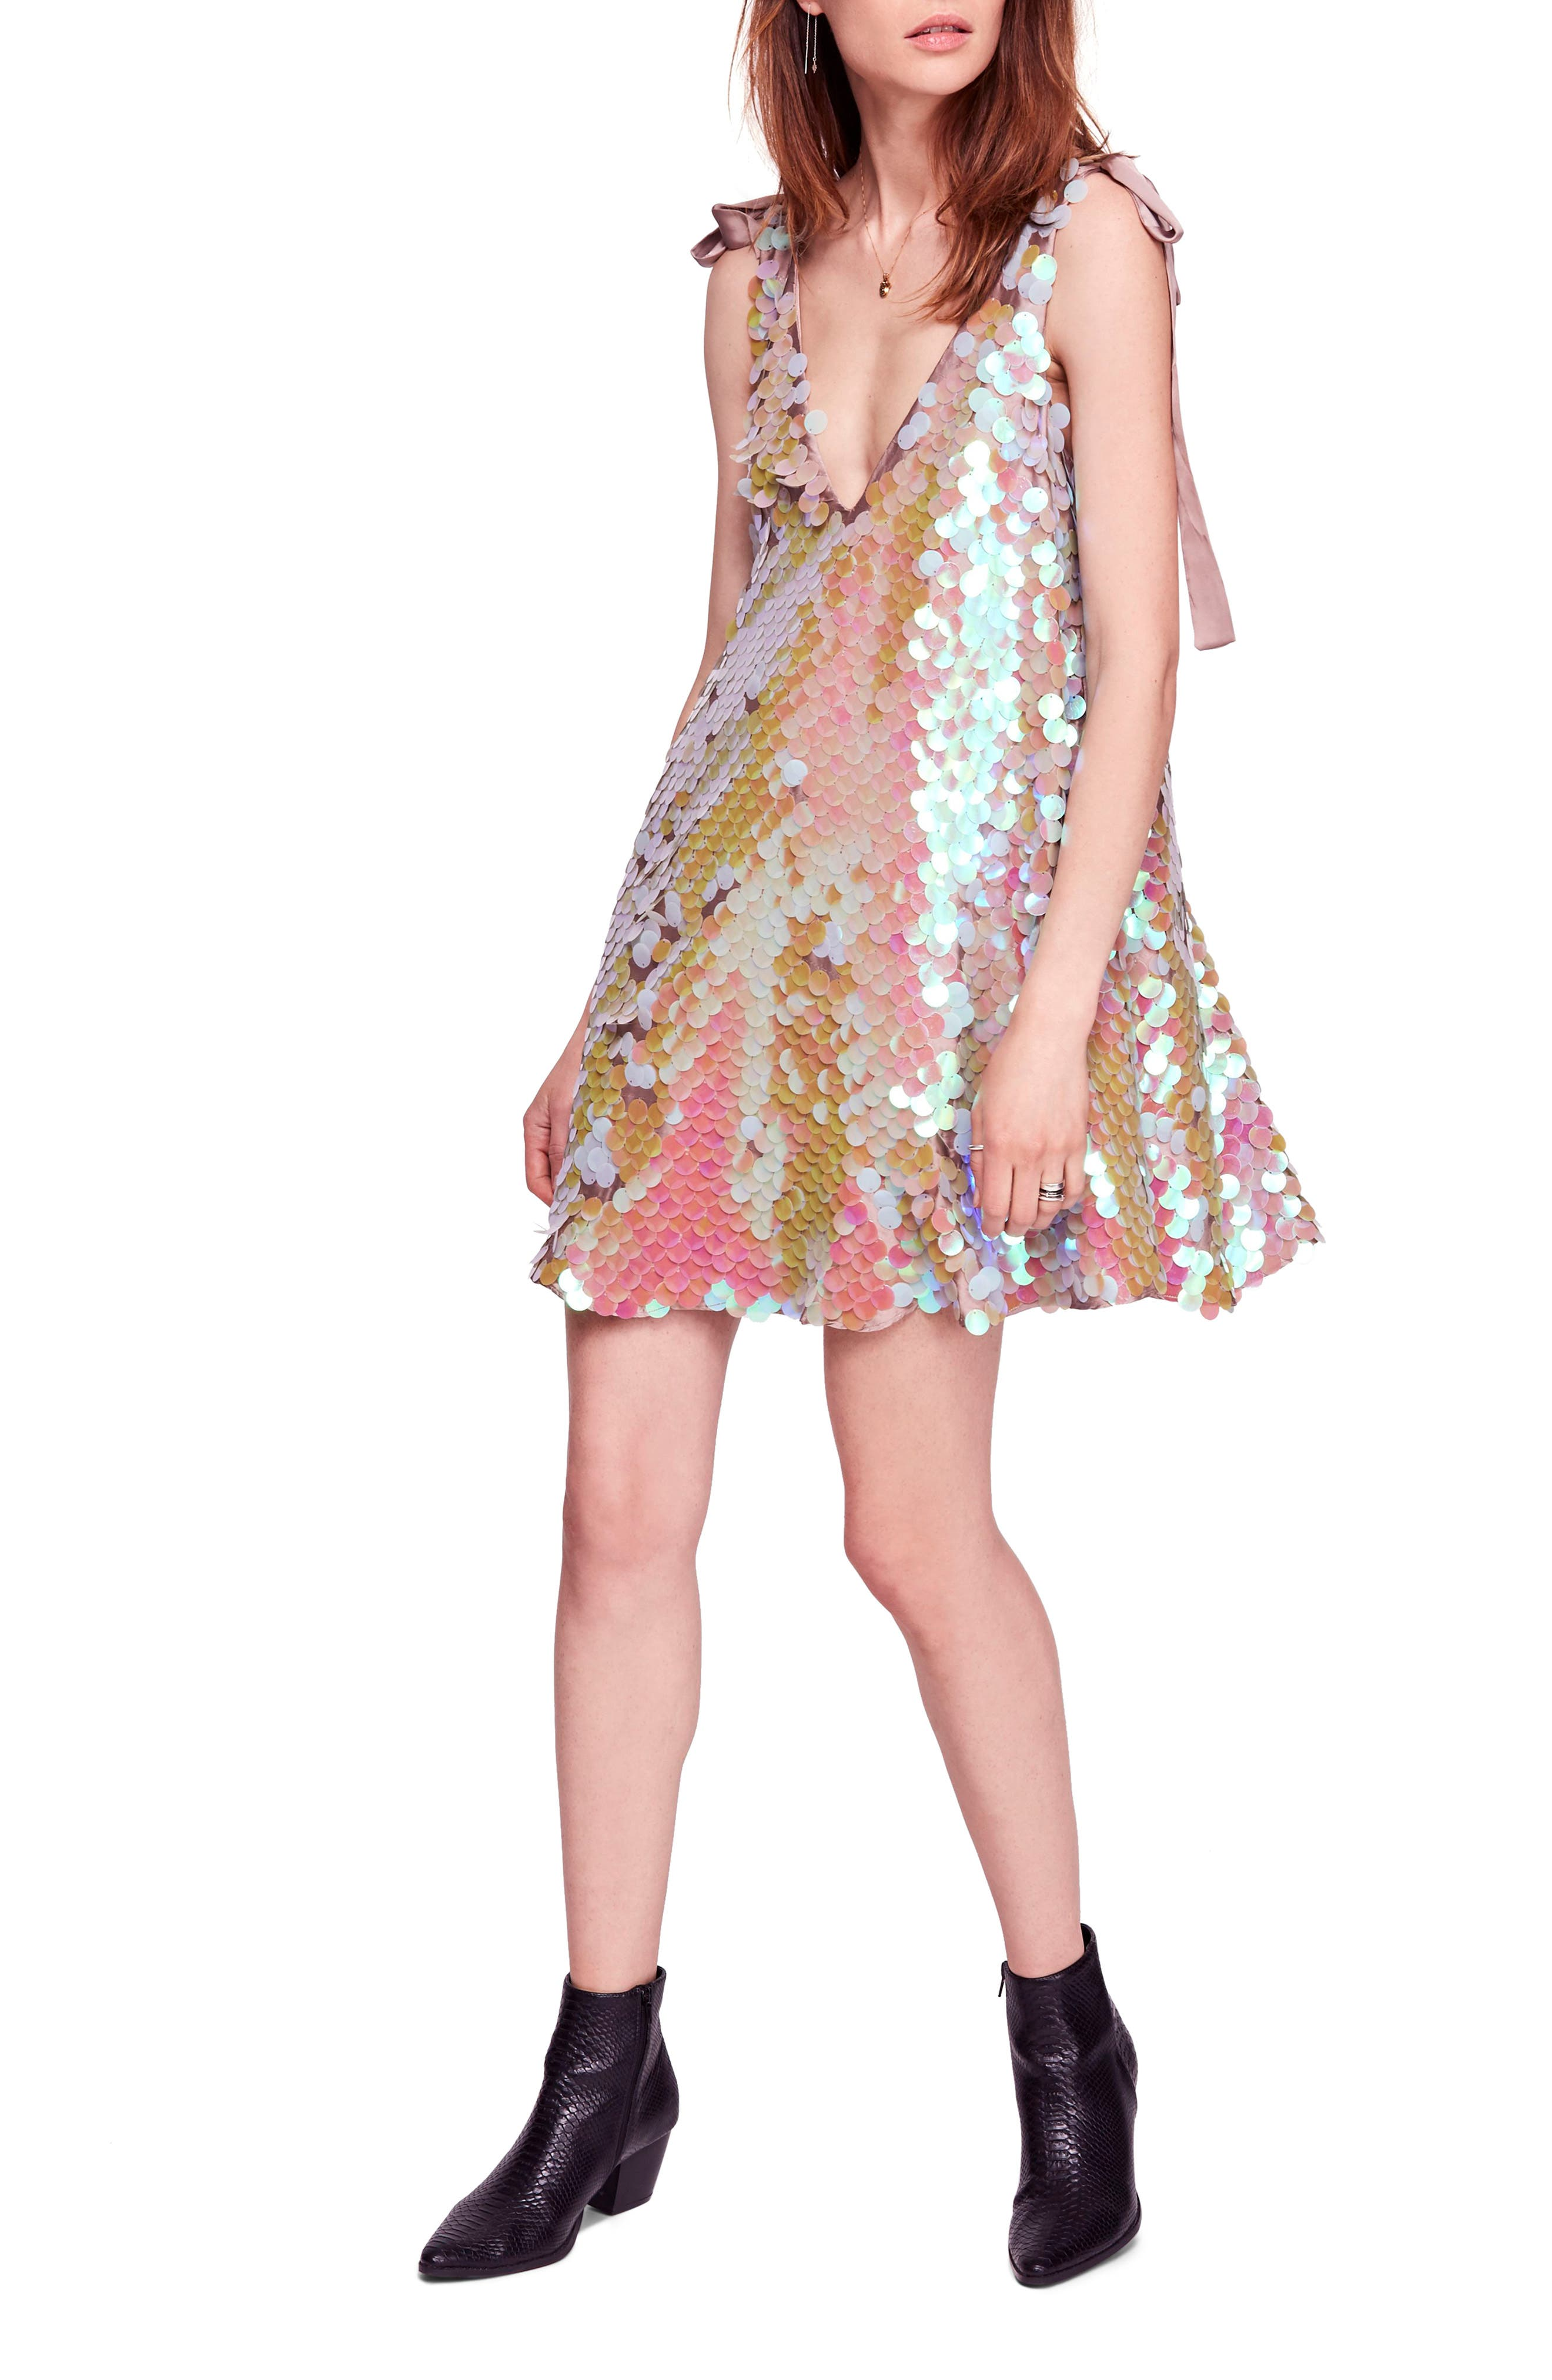 Penelope Glitter Disc Sequin Swing Dress,                             Main thumbnail 1, color,                             440